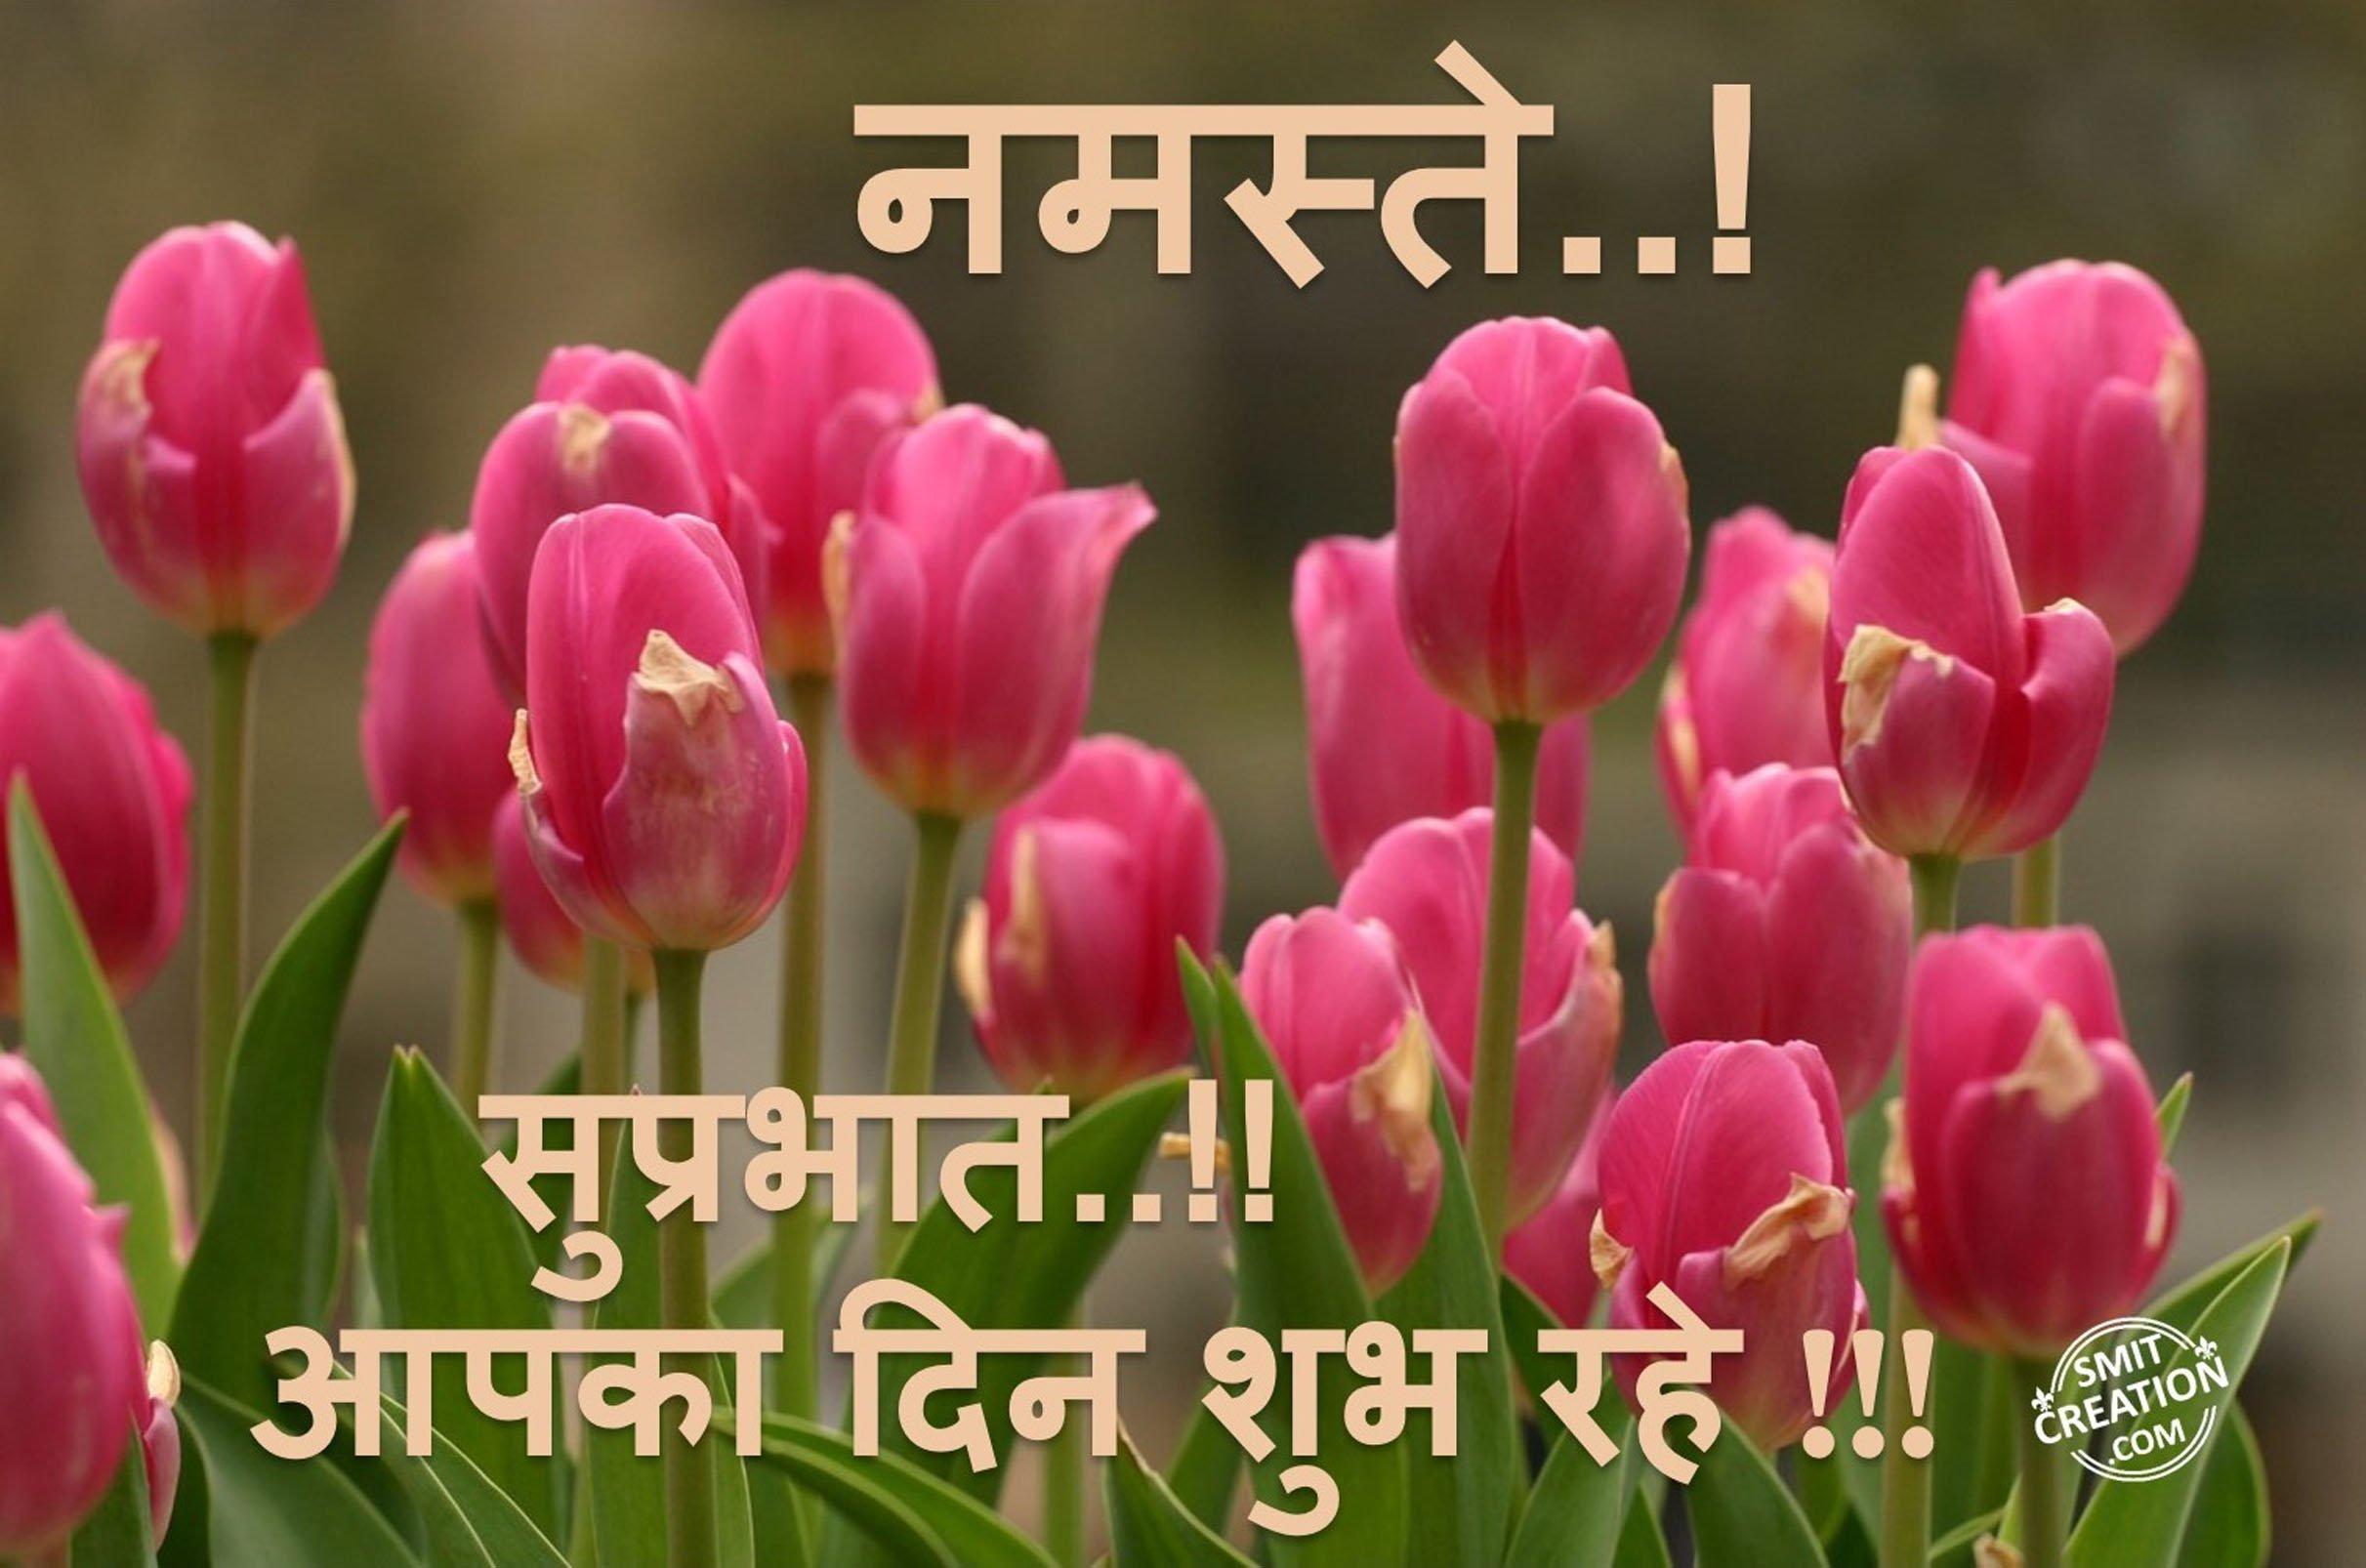 Suprabhat photo animated